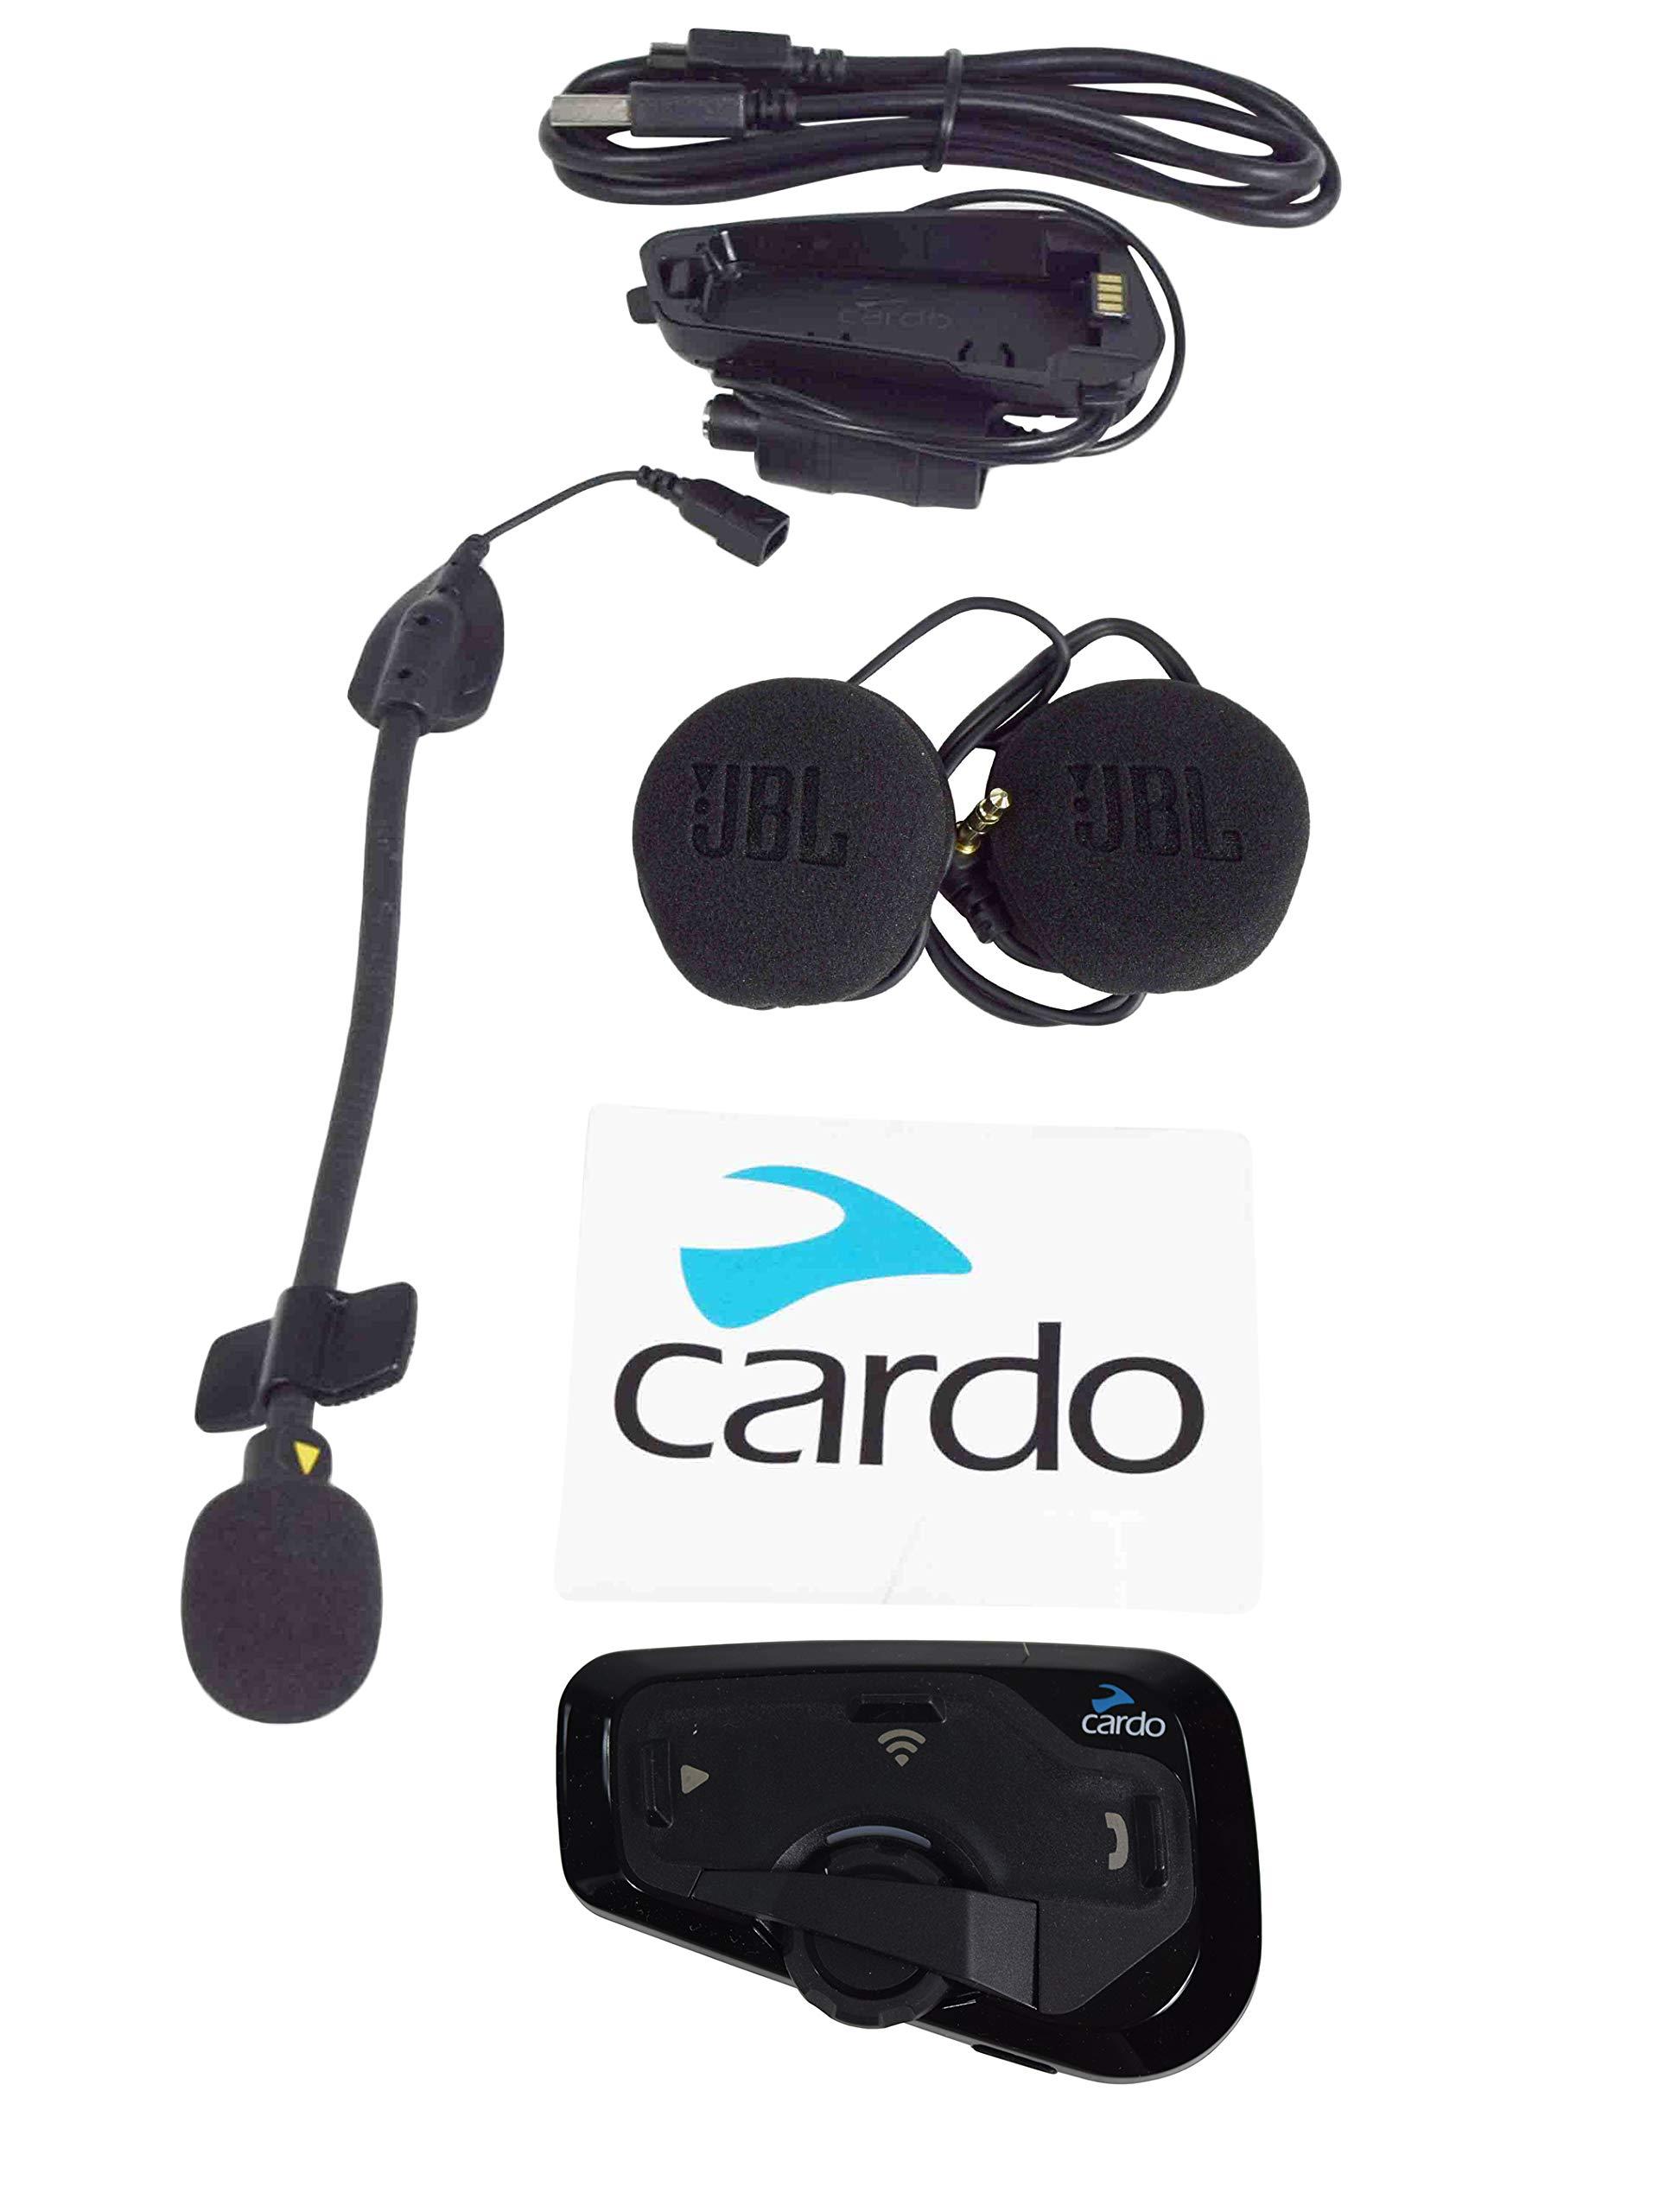 Cardo FREECOM 4+ Bluetooth Motorcycle Helmet Communication Headset JBL Audio (FREECOM 4+)